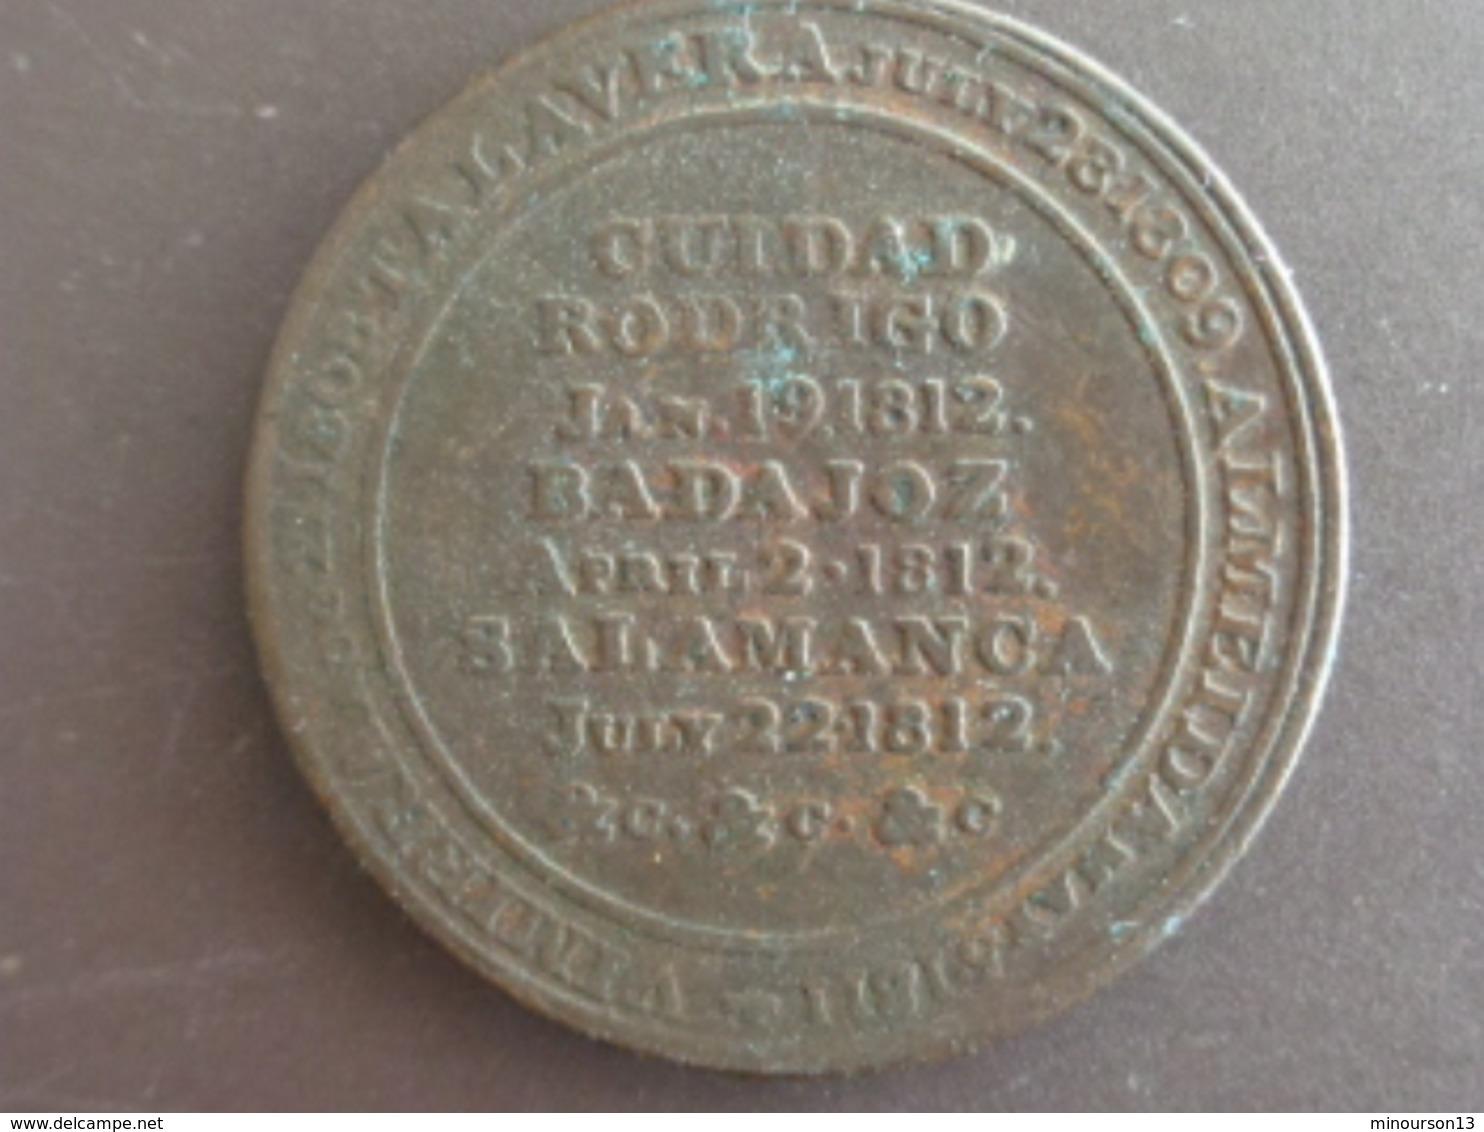 GUIDAD RODRIGO 19 JANVIER 1812 BADAJOZ  2 AVRIL 1812 SALAMANCA 2 JUILLET 1812 - Unknown Origin